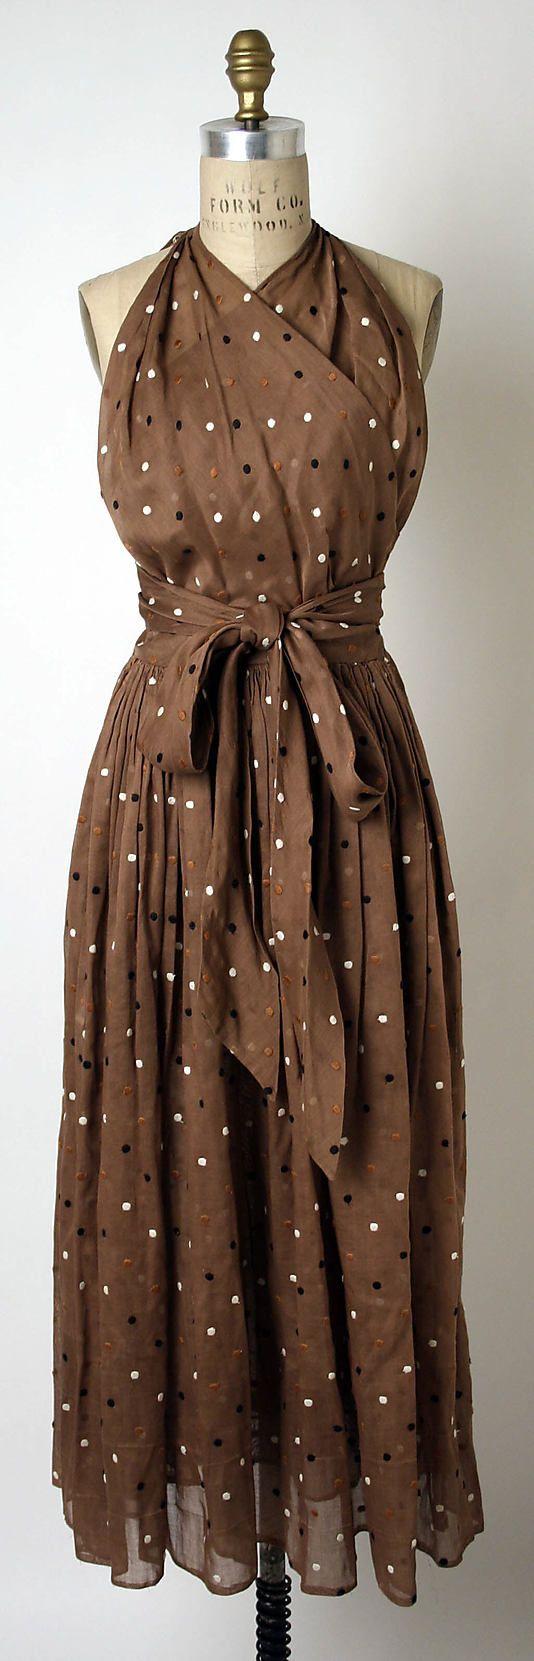 Silk Dress Claire McCardell ca. 1948